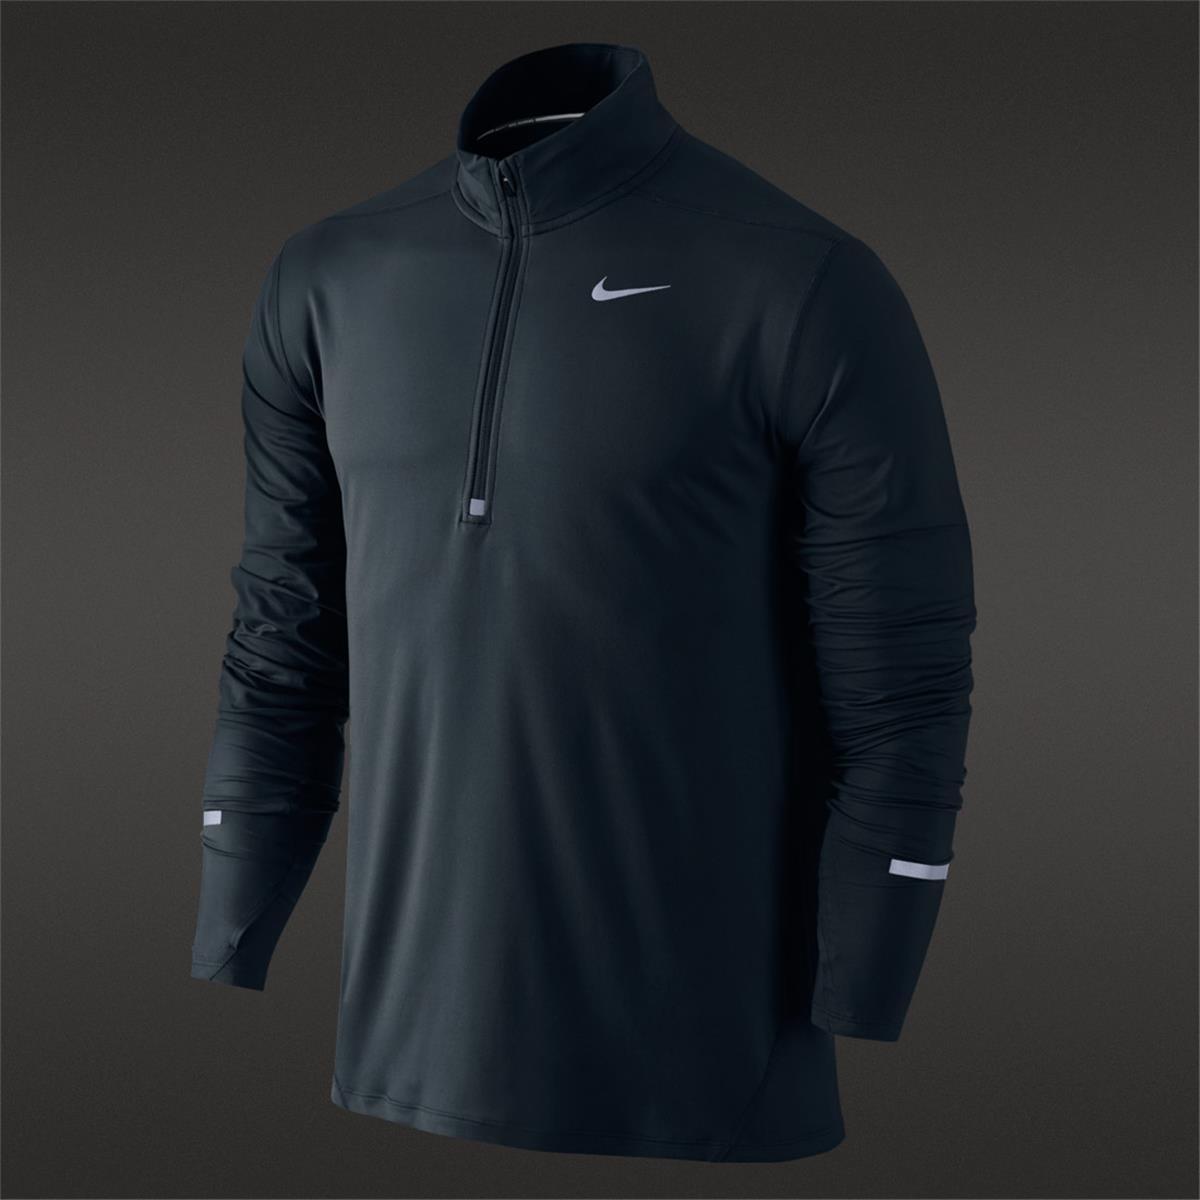 2cc07f79107c Nike Dri-Fit Element Half Zip Mens Top (Black)